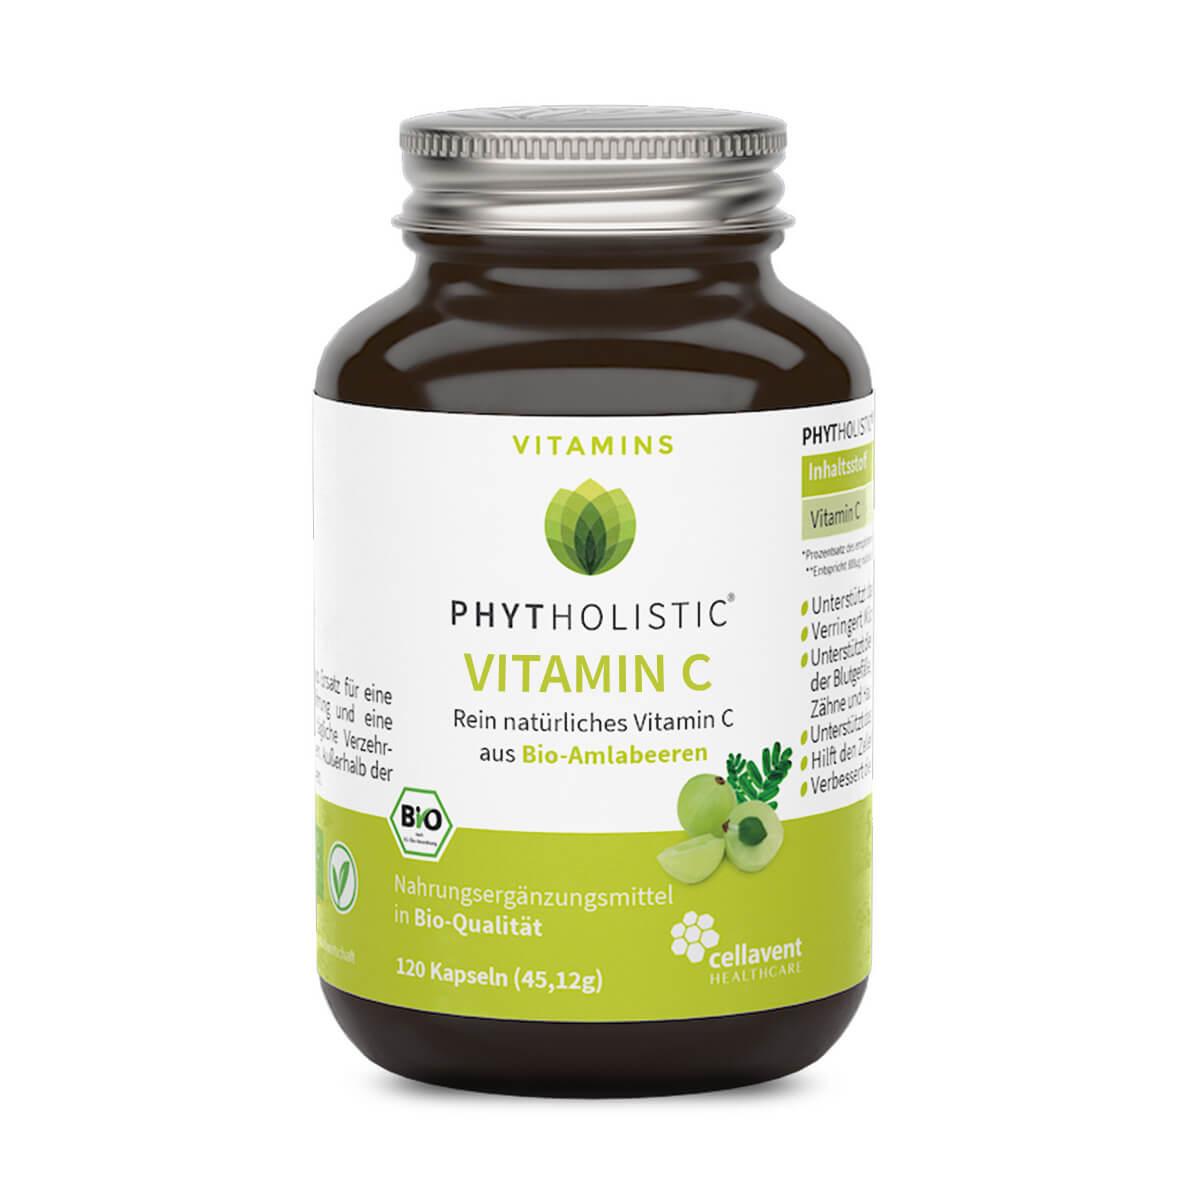 vitamin-c-kapseln-bio-rein-pflanzlich-phytholistic-120-stueck-glas-vorne-1200×1200